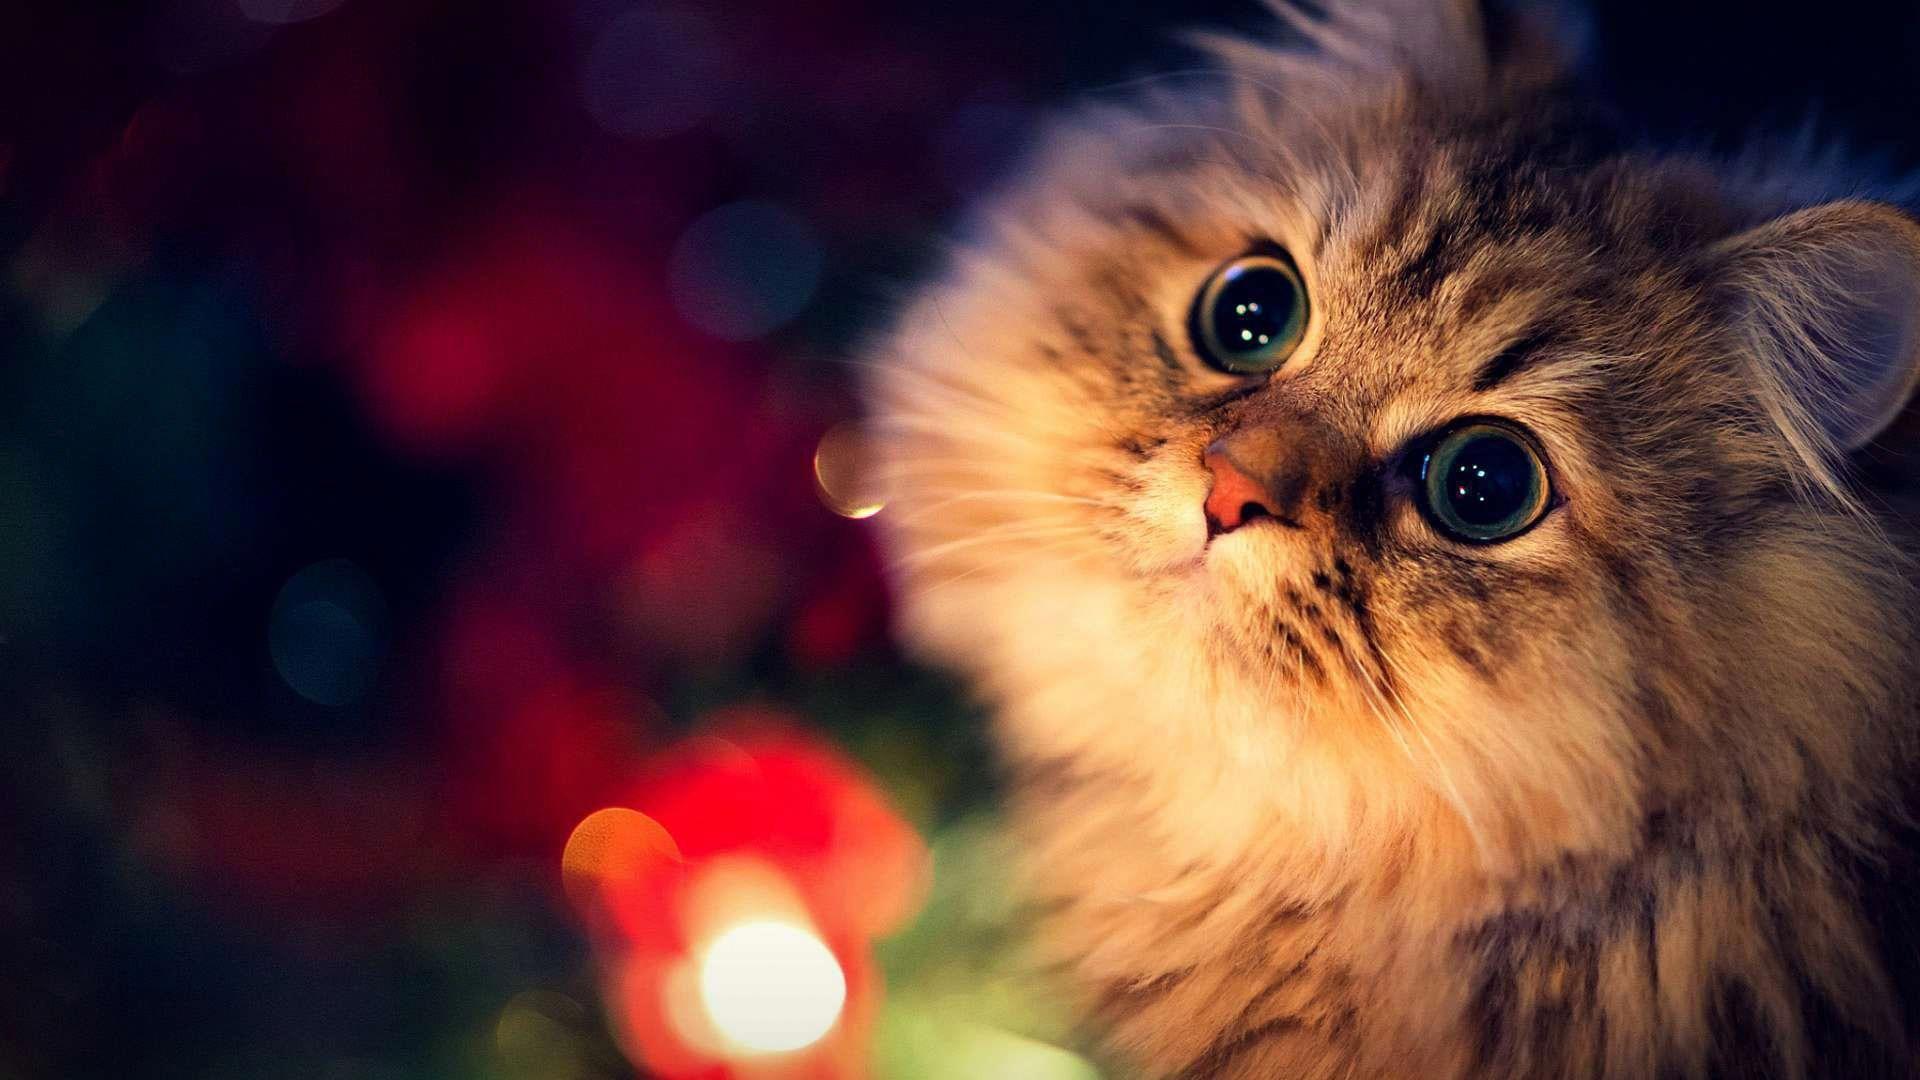 Beautiful Hd Quality Desktop Background Wallpaper 1080p Hd Image Animal Wallpaper Cat Wallpaper Christmas Cats